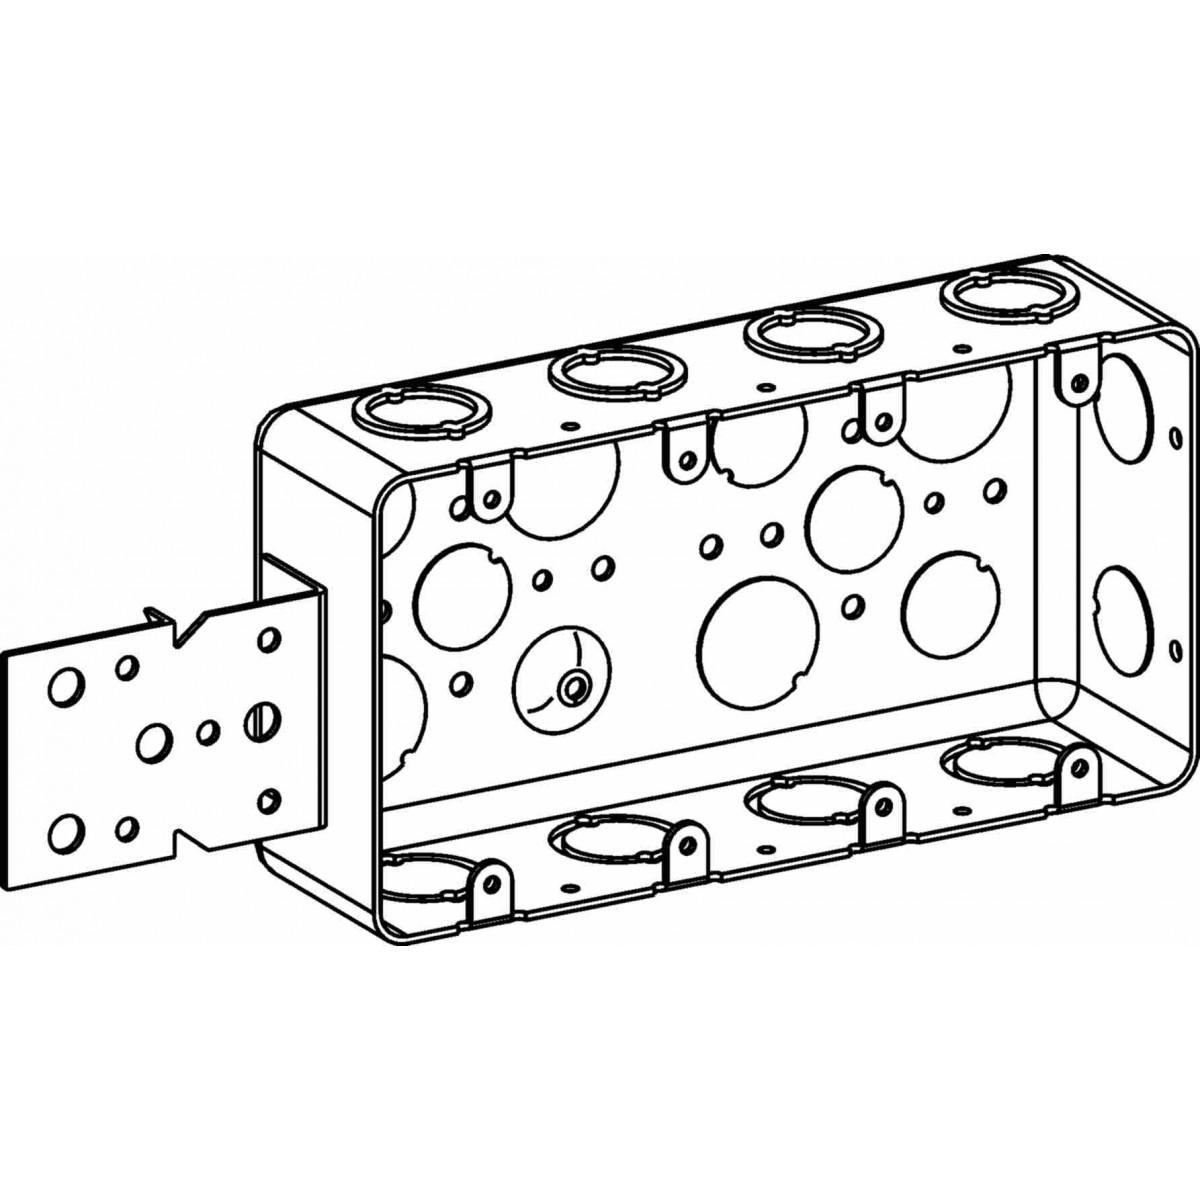 dhb-4-b - multigang boxes